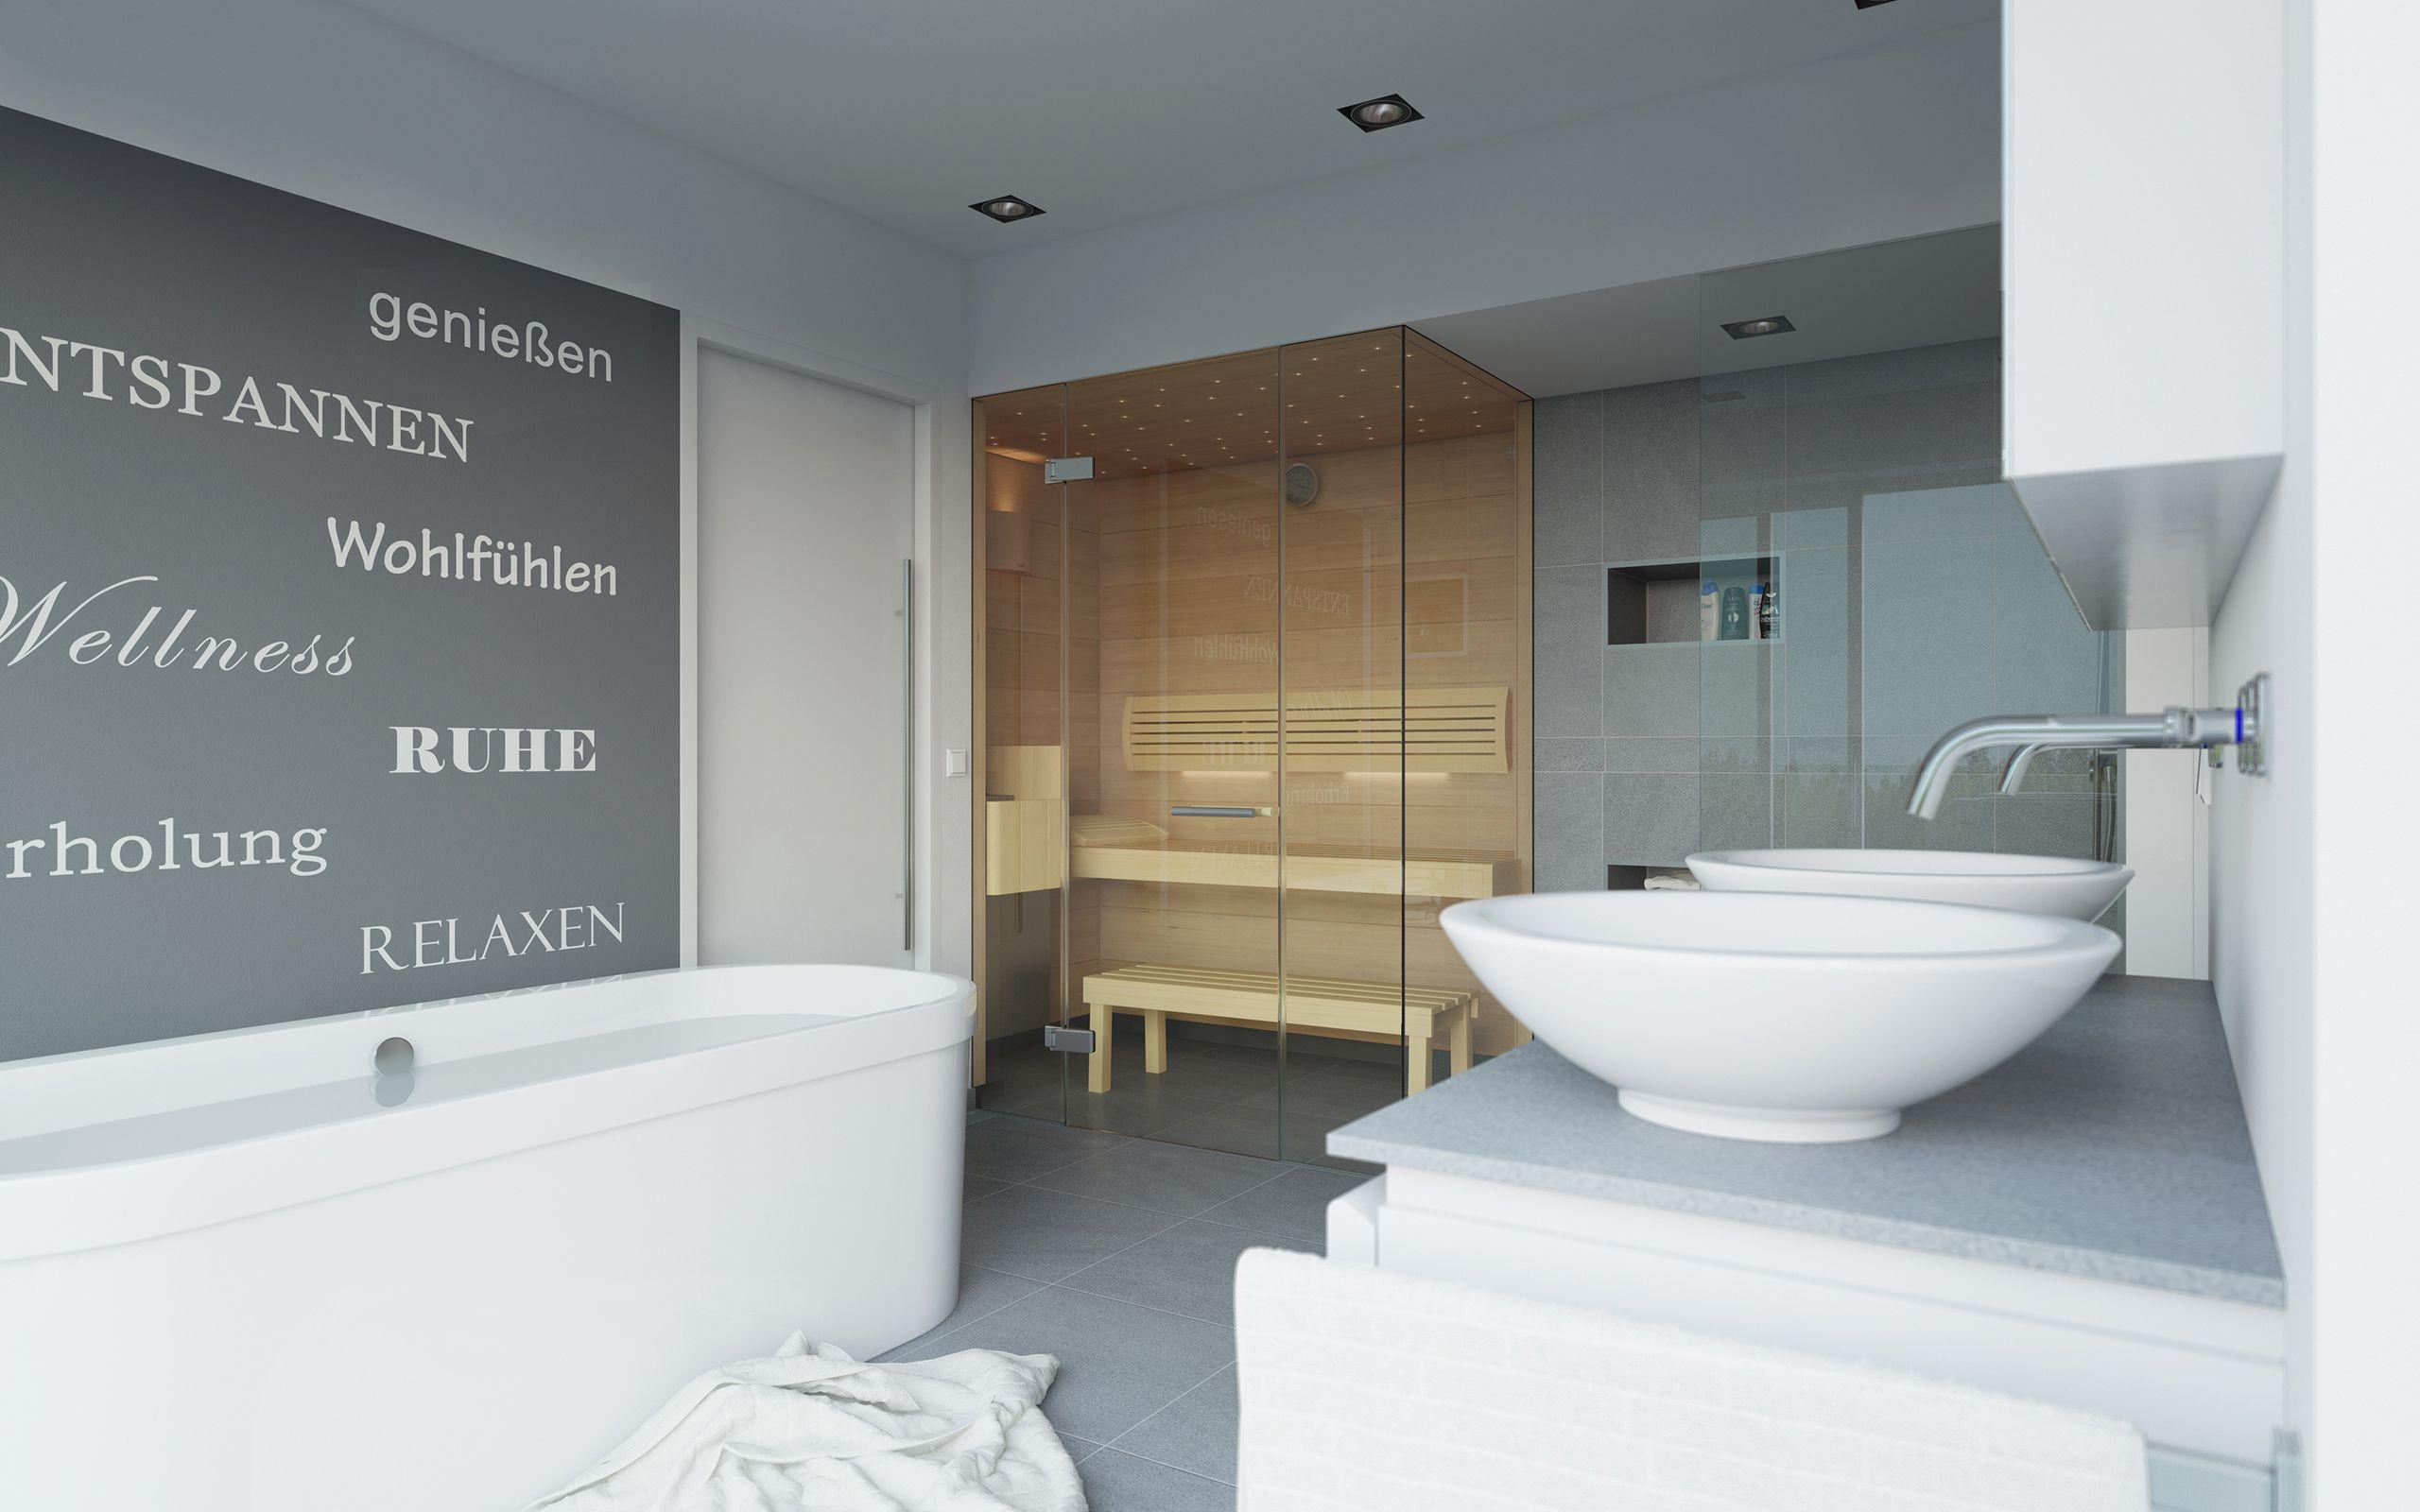 Badezimmer Sauna ~ Sauna im badezimmer google suche home sauna